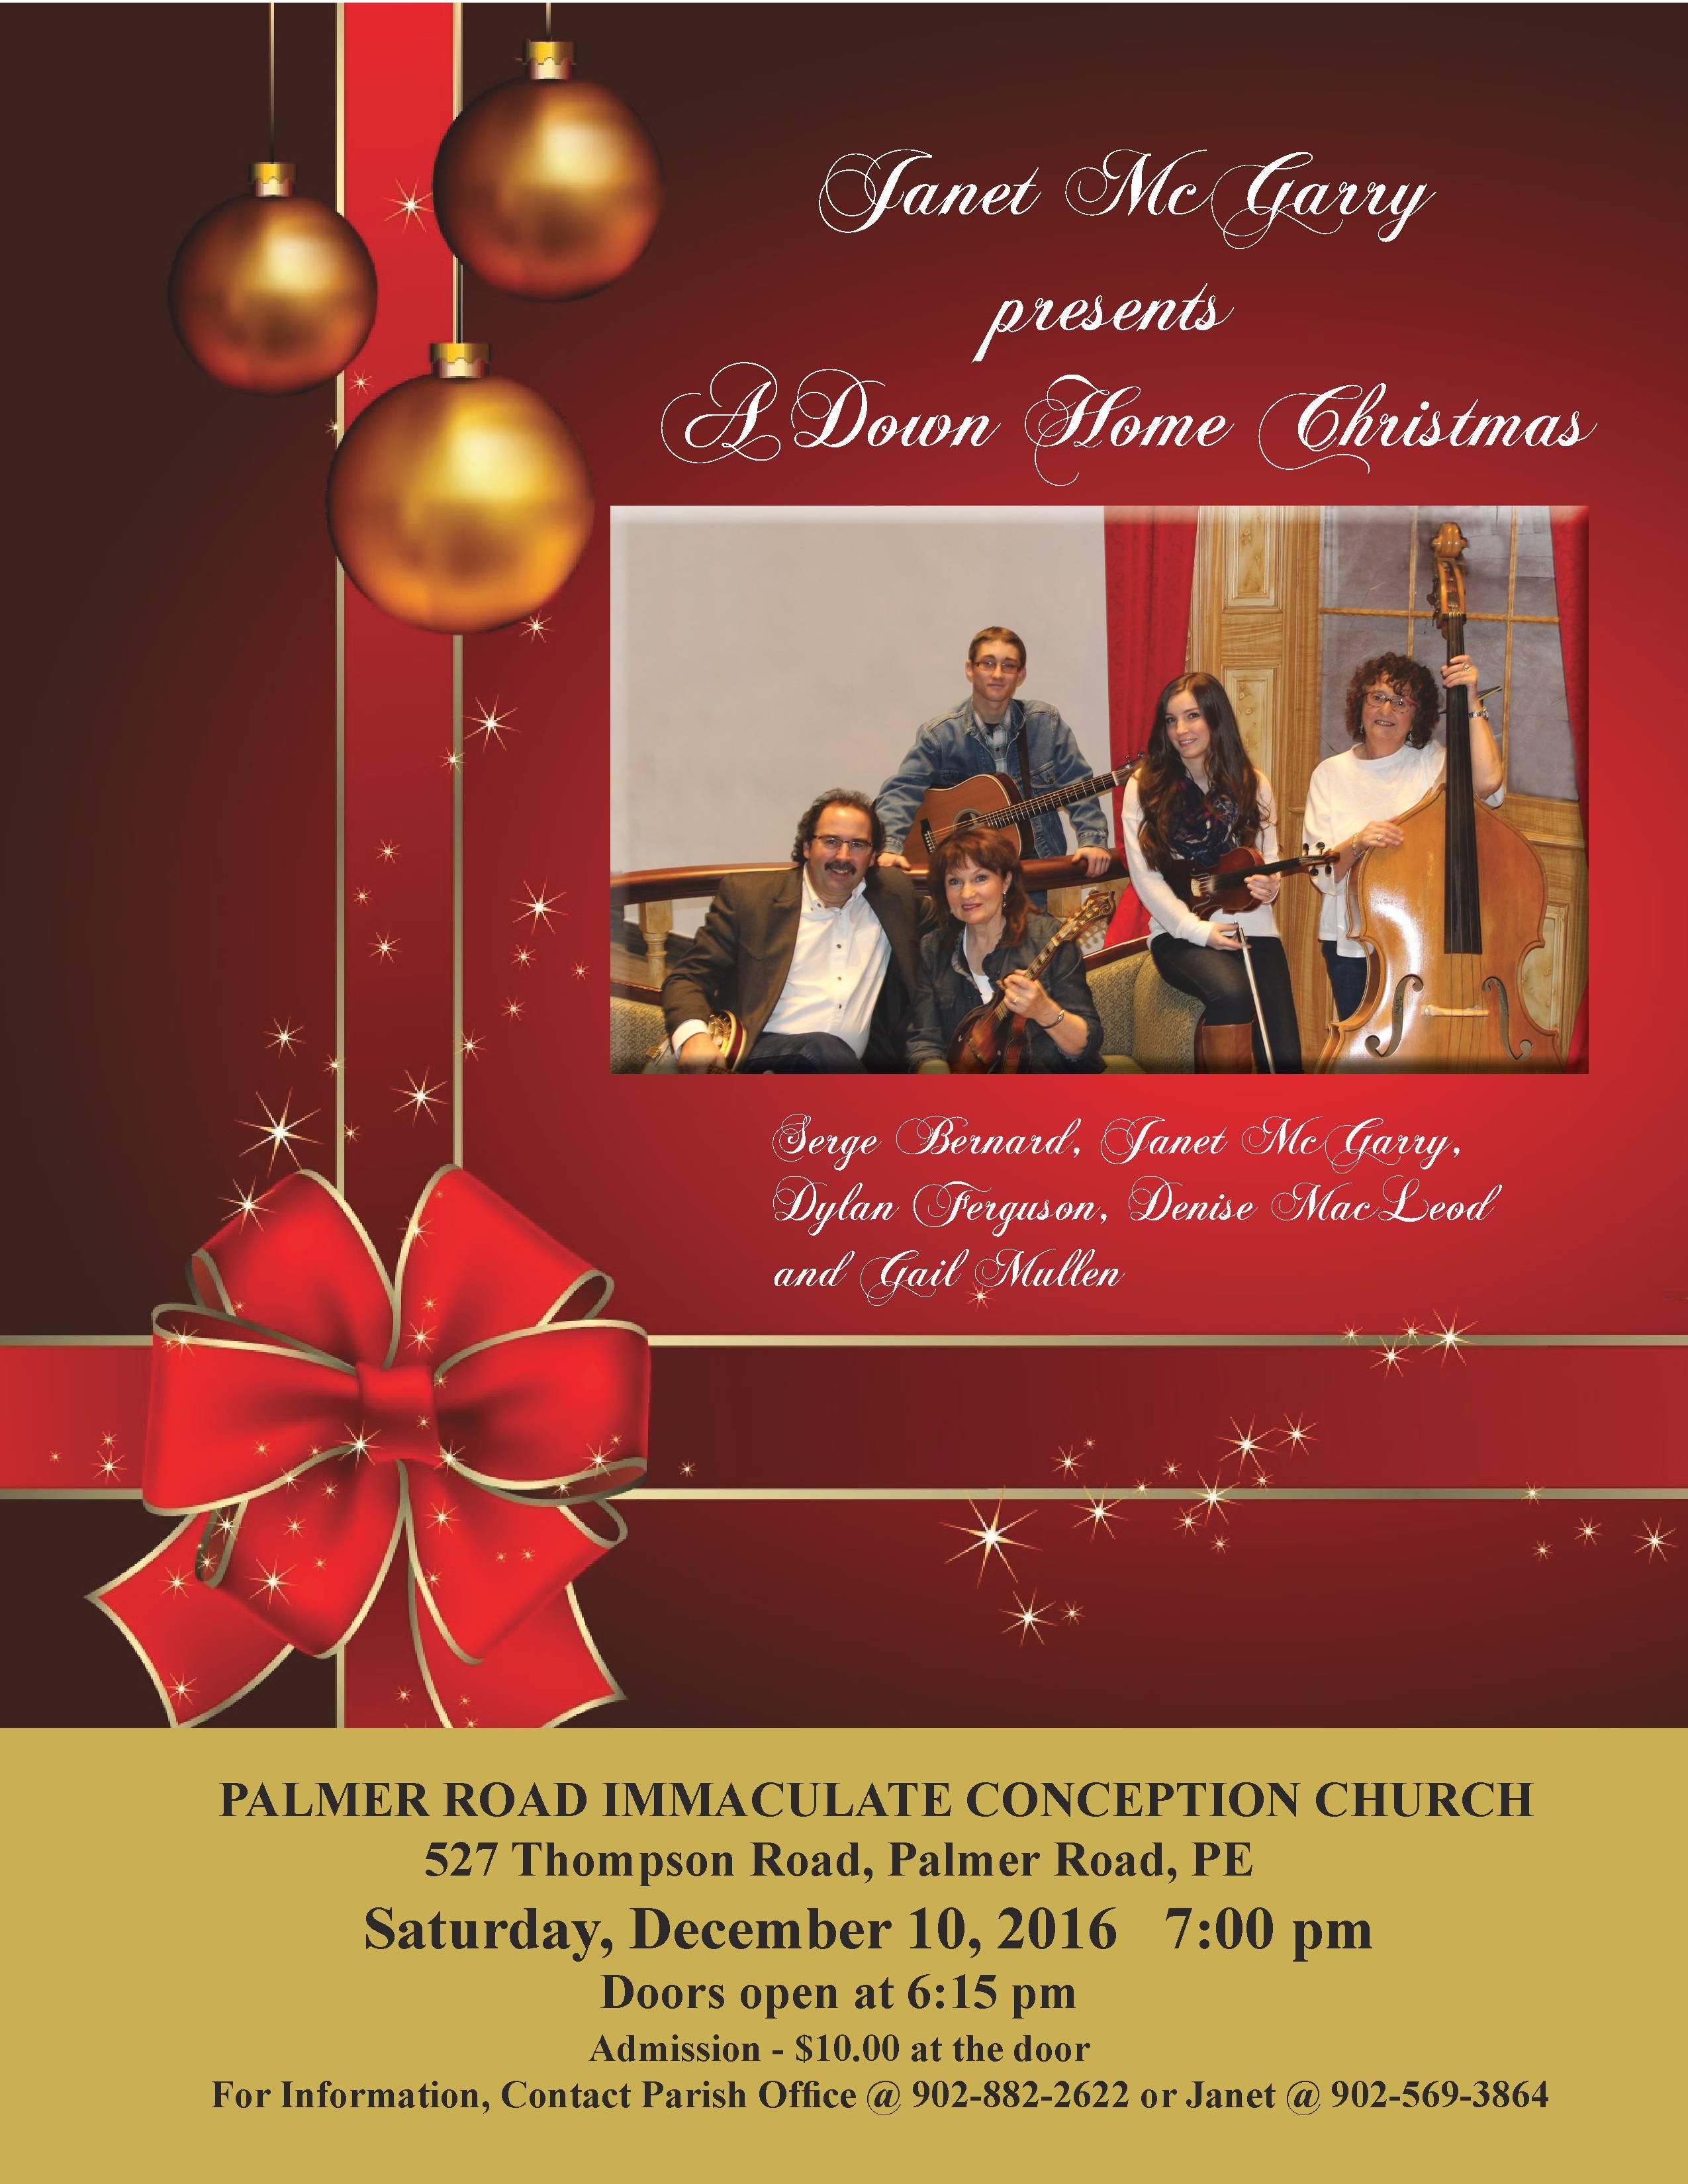 A Down Home Christmas, Palmer Road December 10, 2016